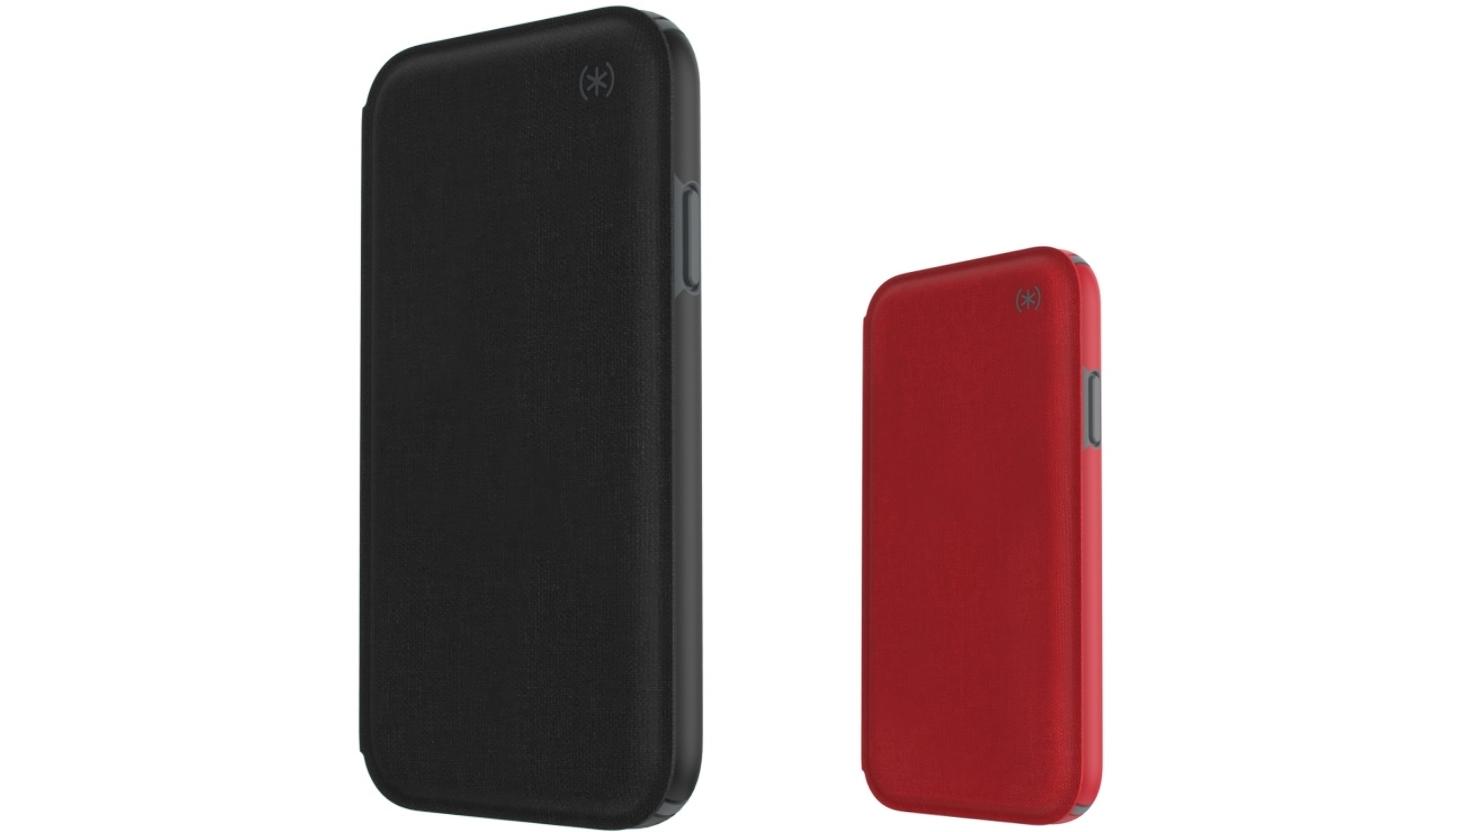 timeless design 3ce21 6deaf Speck Presidio Folio Case for iPhone XR